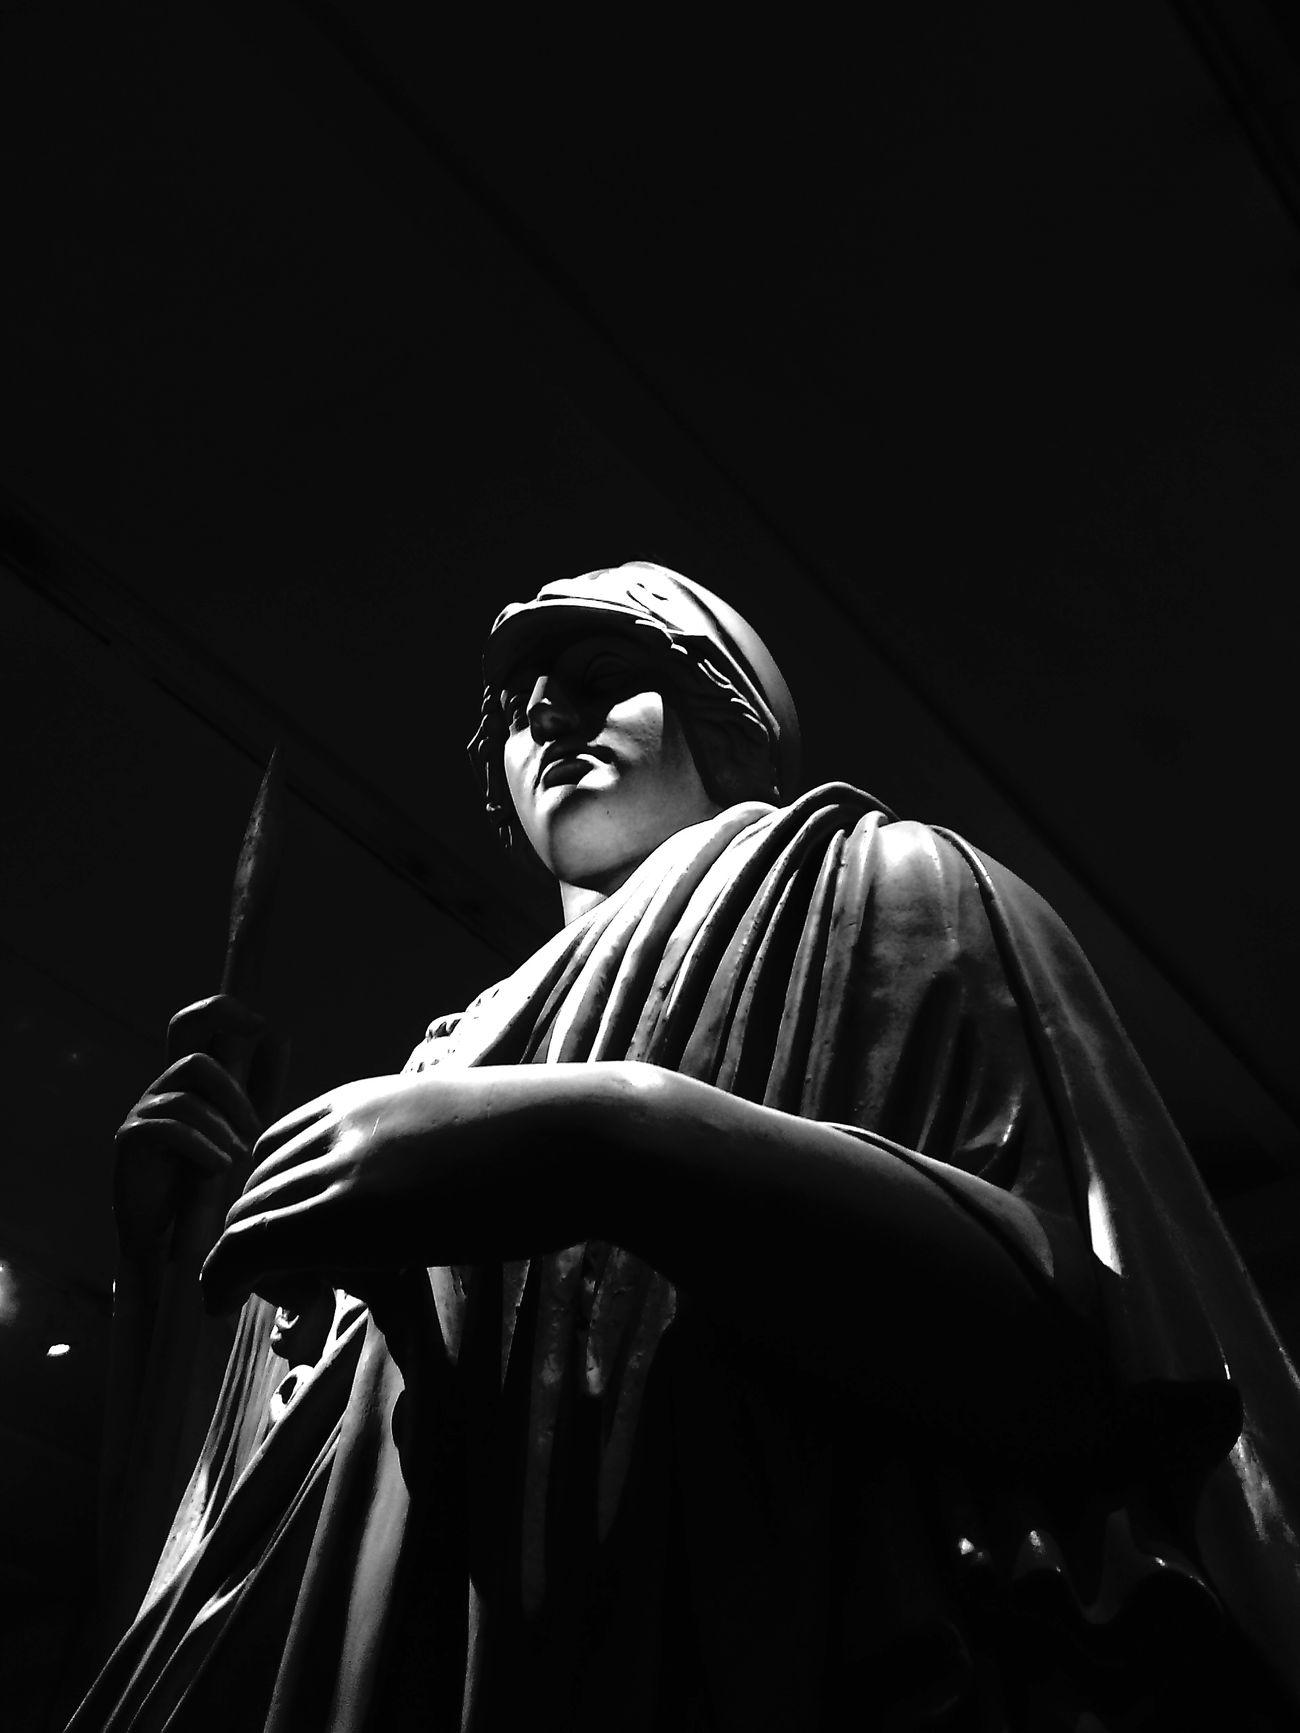 Cdmx2016 EyeEm Museo Mexico City Fredymarin Black And White Photography EyeEm Gallery Eyeemphoto Arte Art Fotografia Fotocatchers Black & White Followme Photography